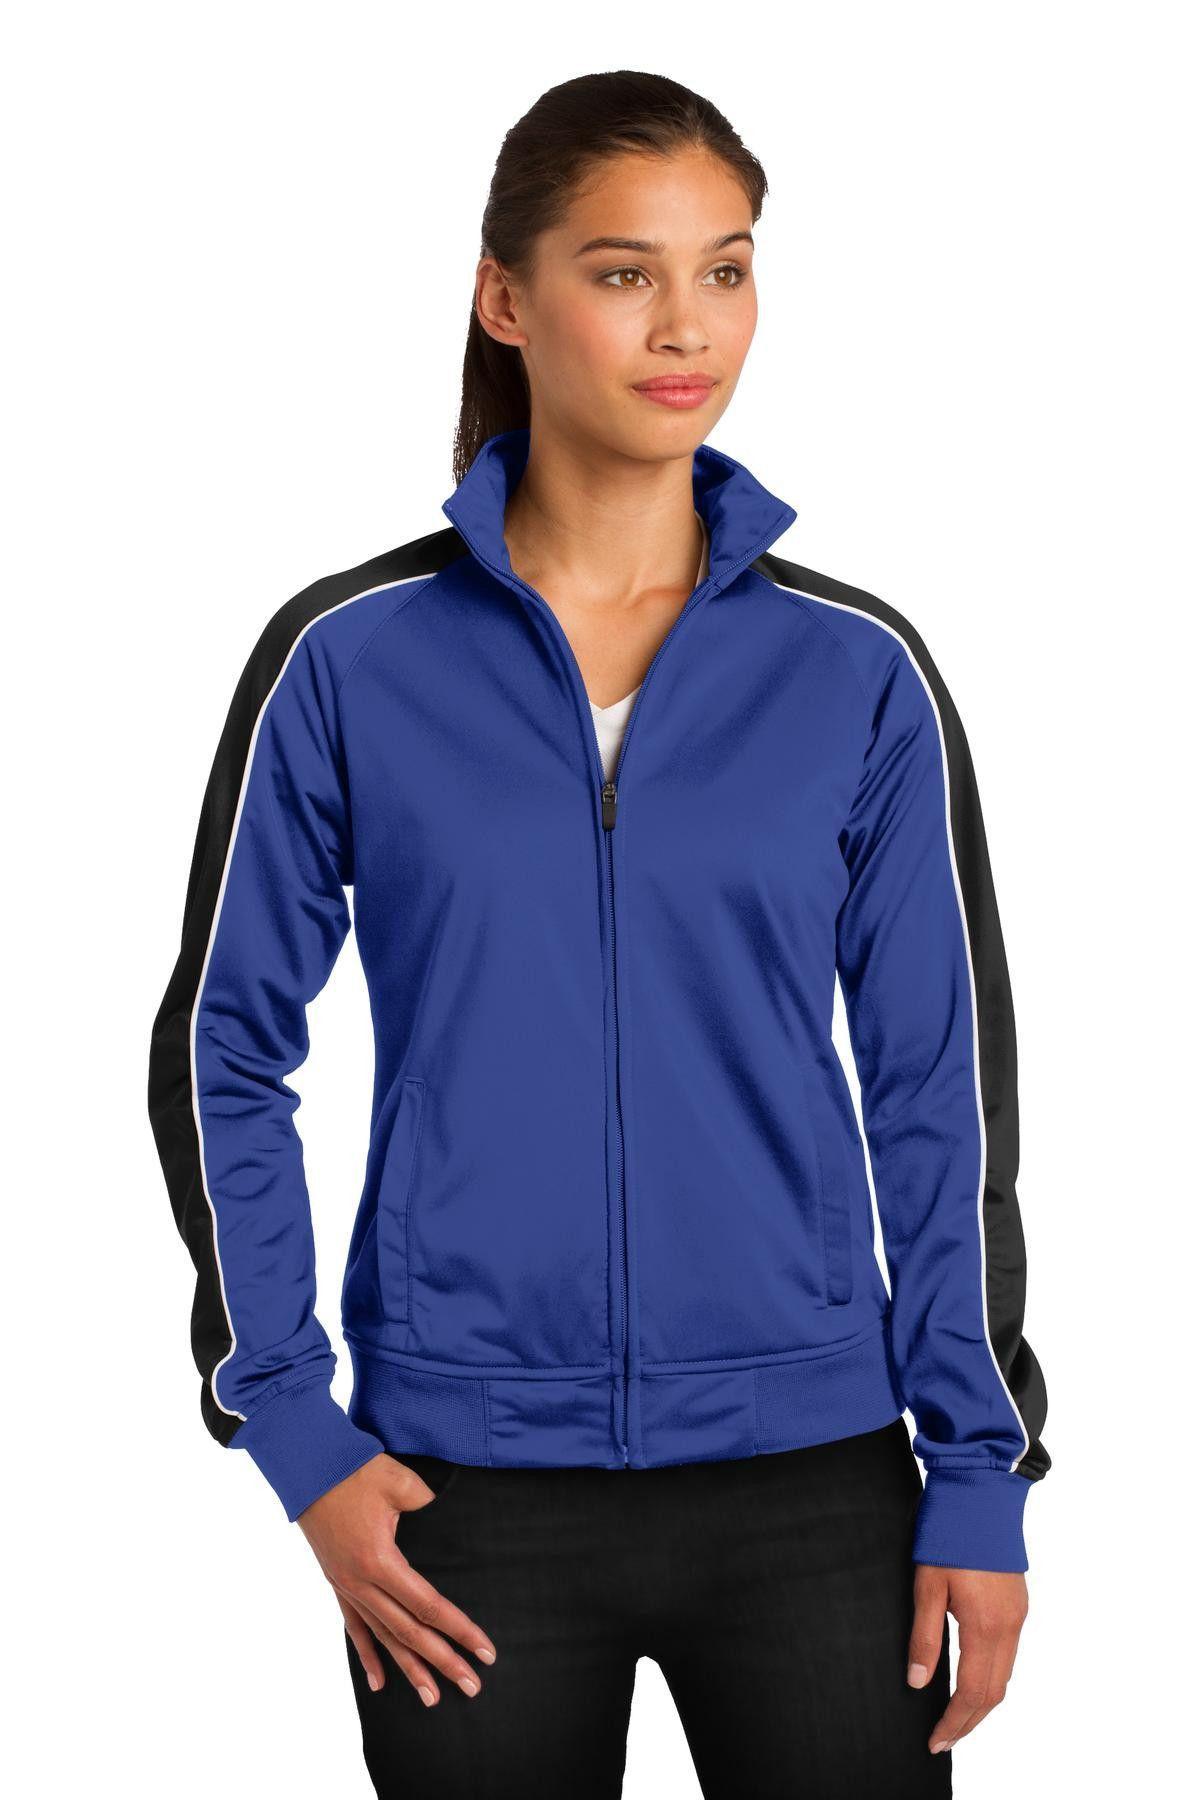 SportTek Ladies Piped Tricot Track Jacket LST92 True